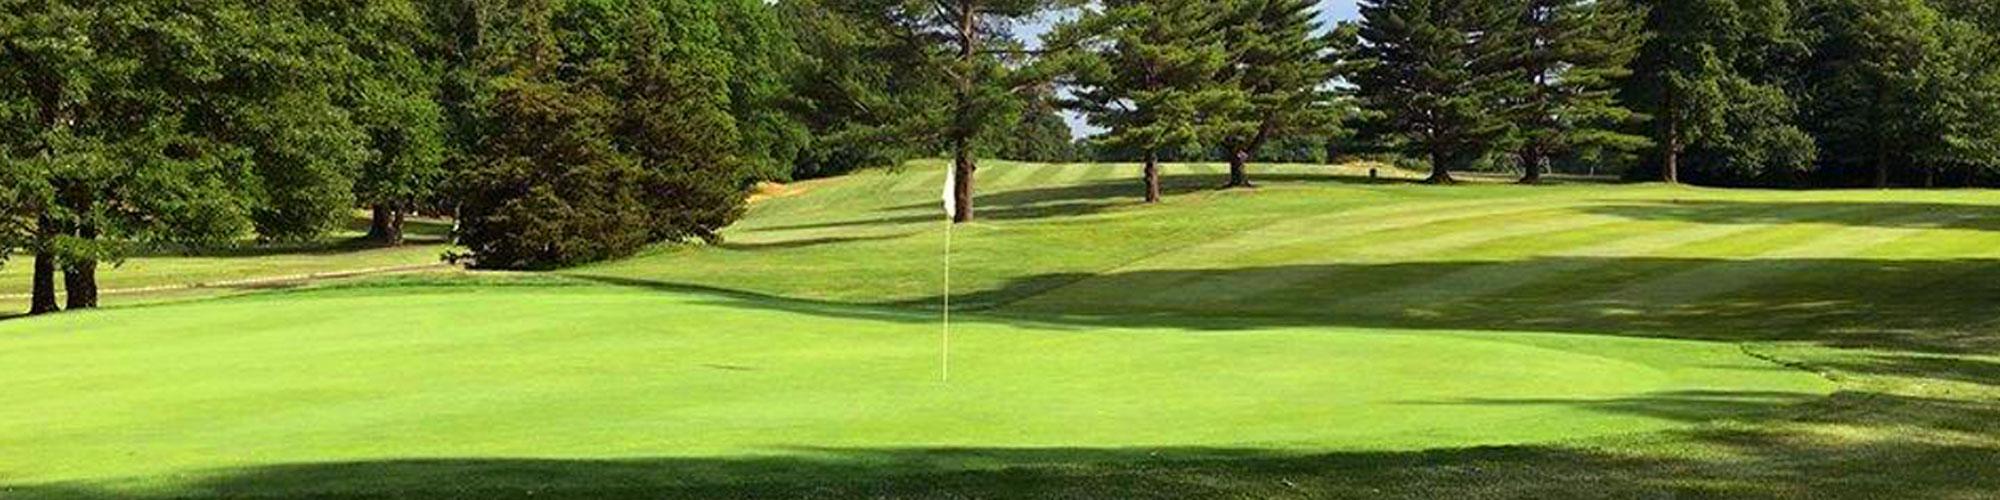 Golf Carts Cart Fees Oak Hills Park Golf Course In